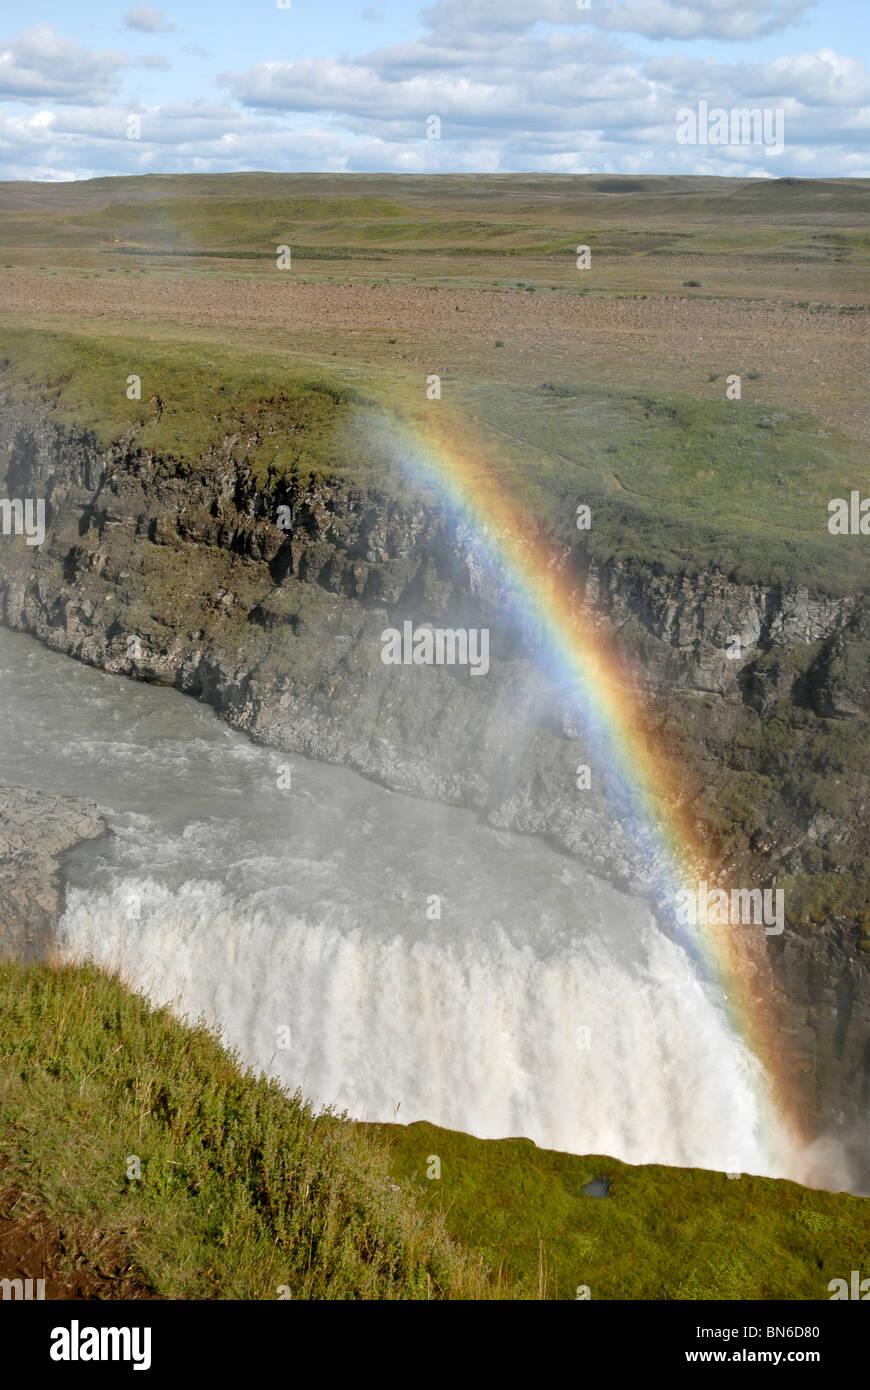 Gullfoss waterfall, Iceland. - Stock Image